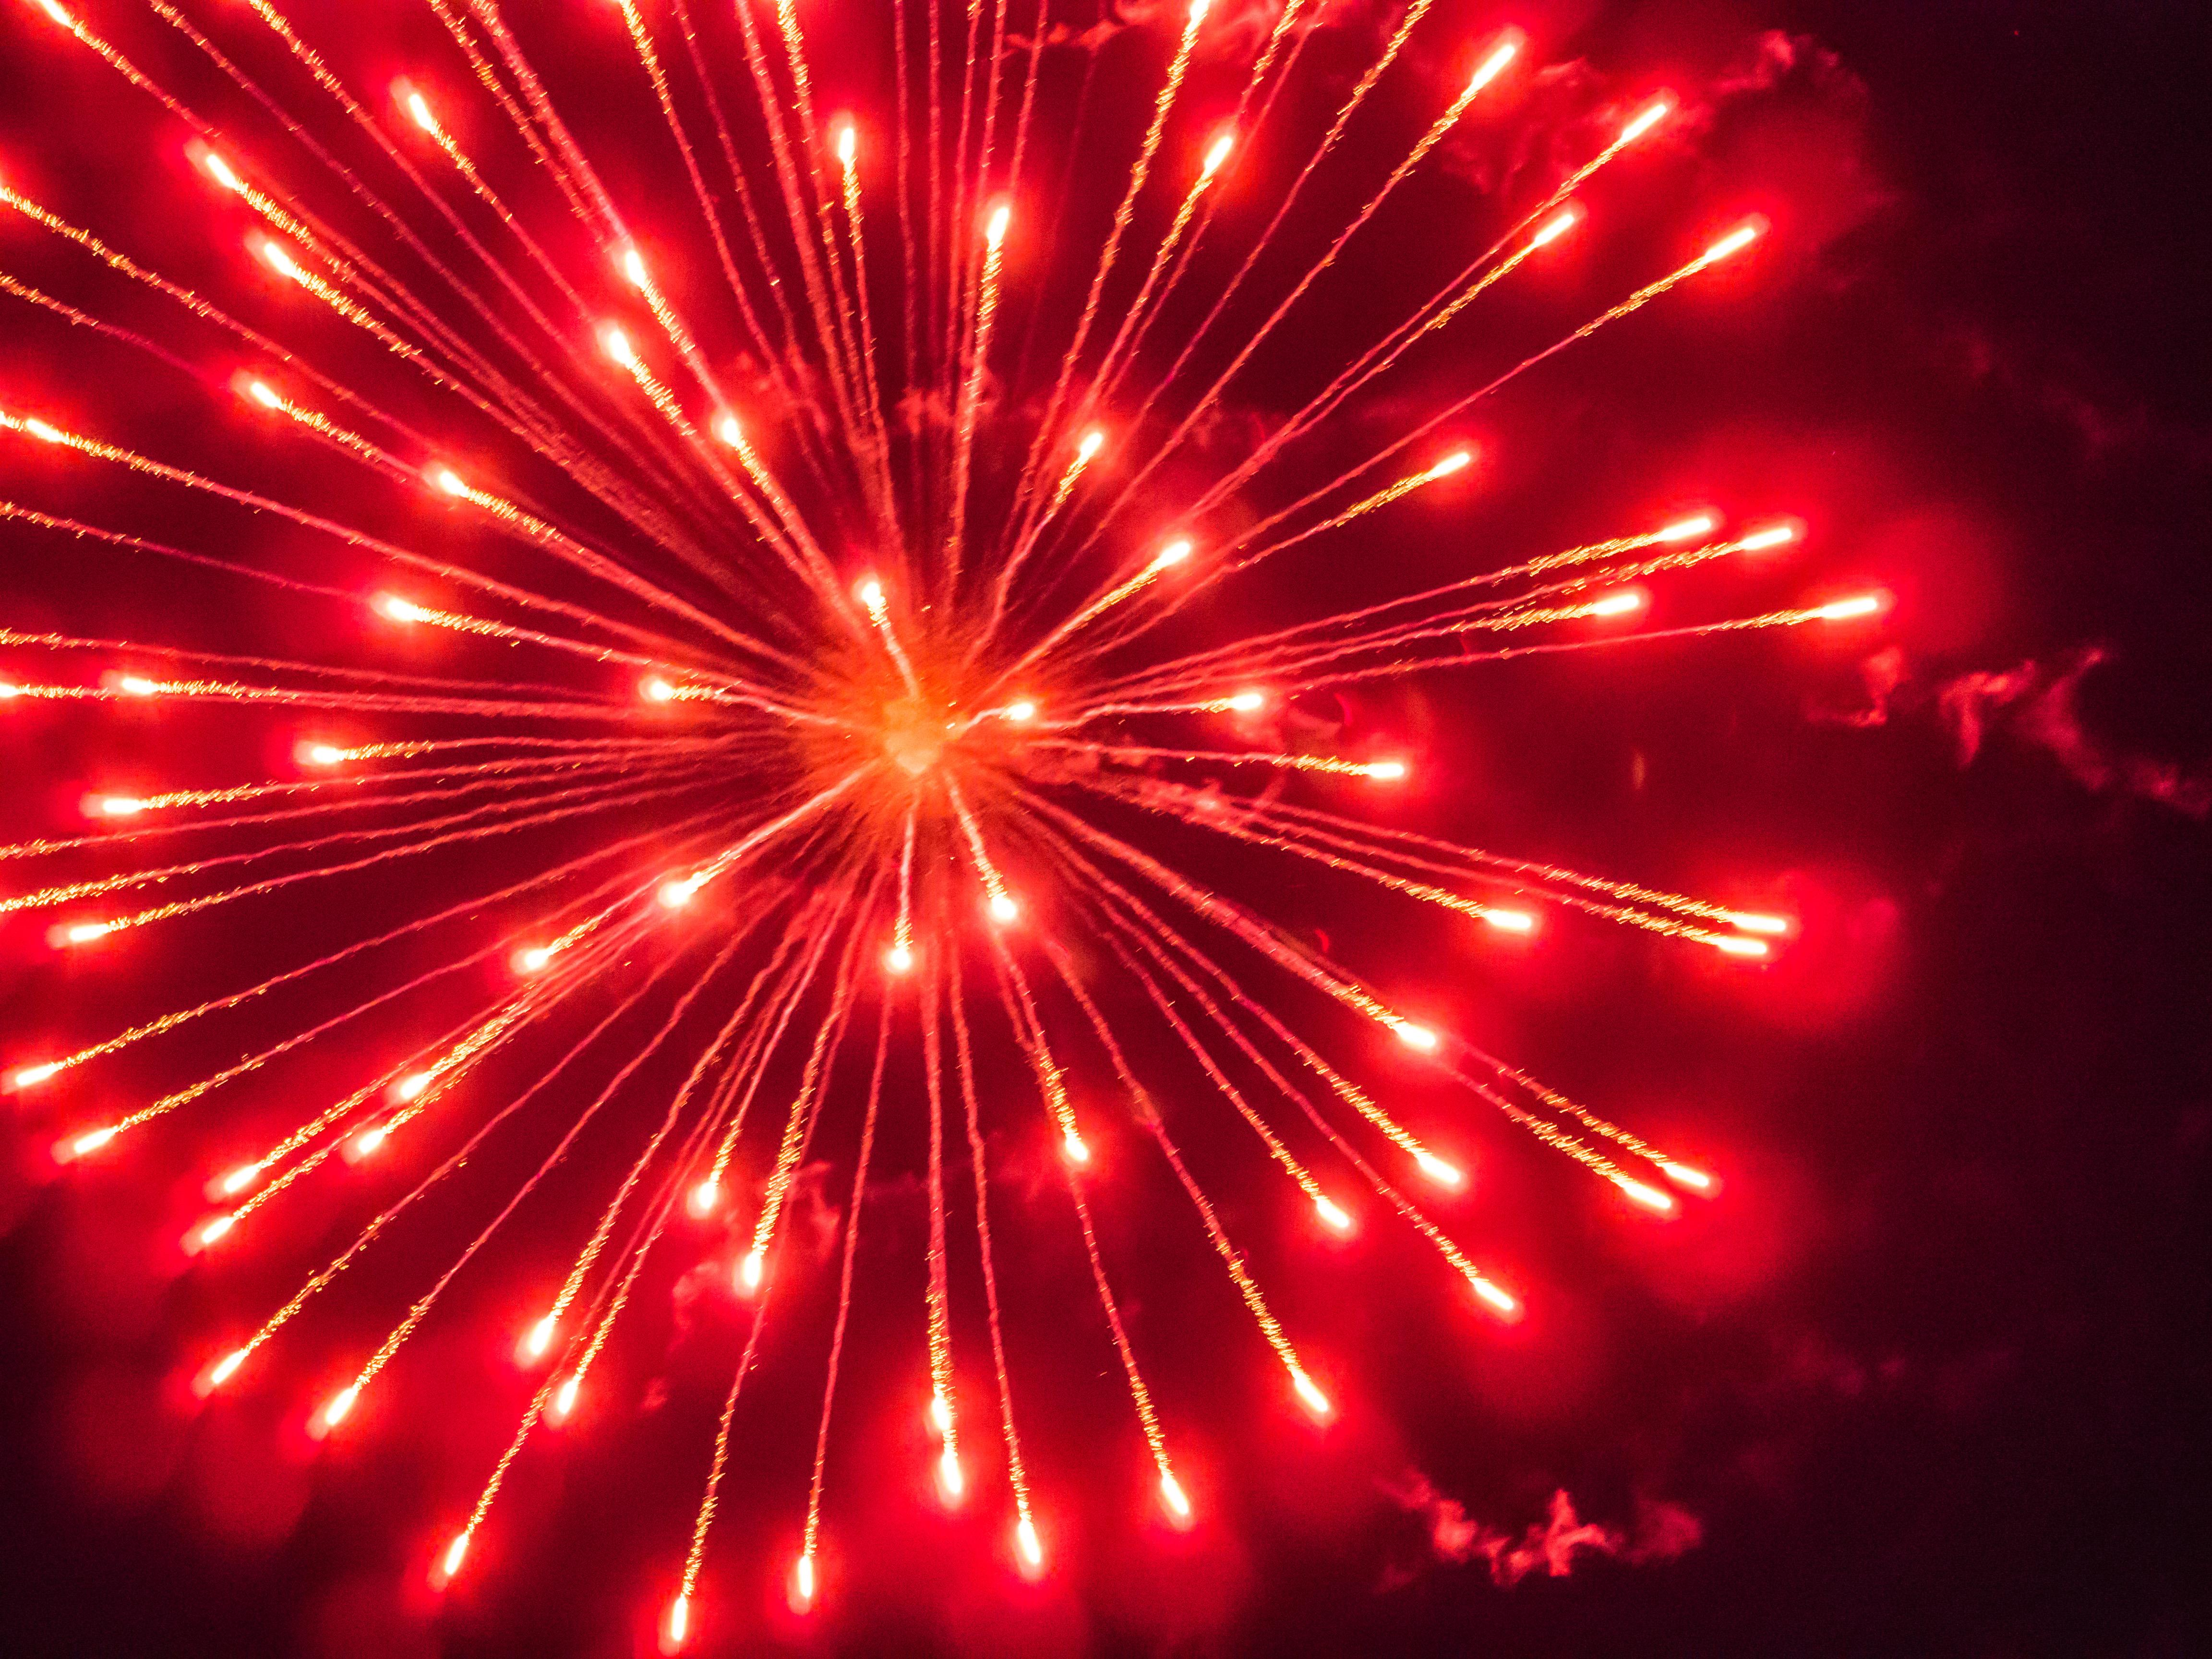 St cyprien pre bastille day fireworks at garrit-france-em10-20150713-p7130313.jpg photo